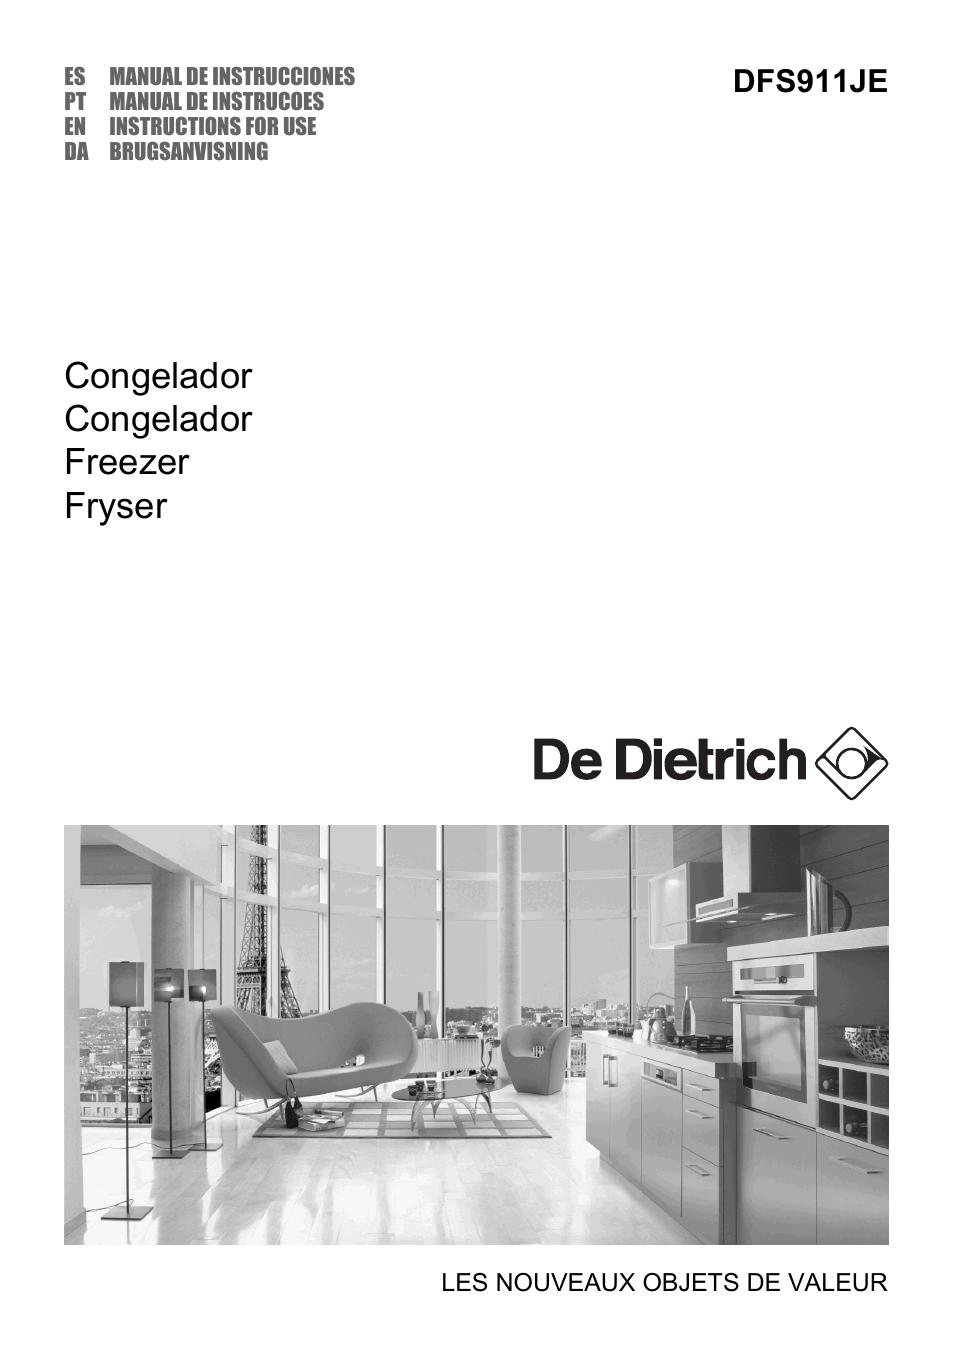 de dietrich dfs911je manual del usuario p u00e1ginas 16